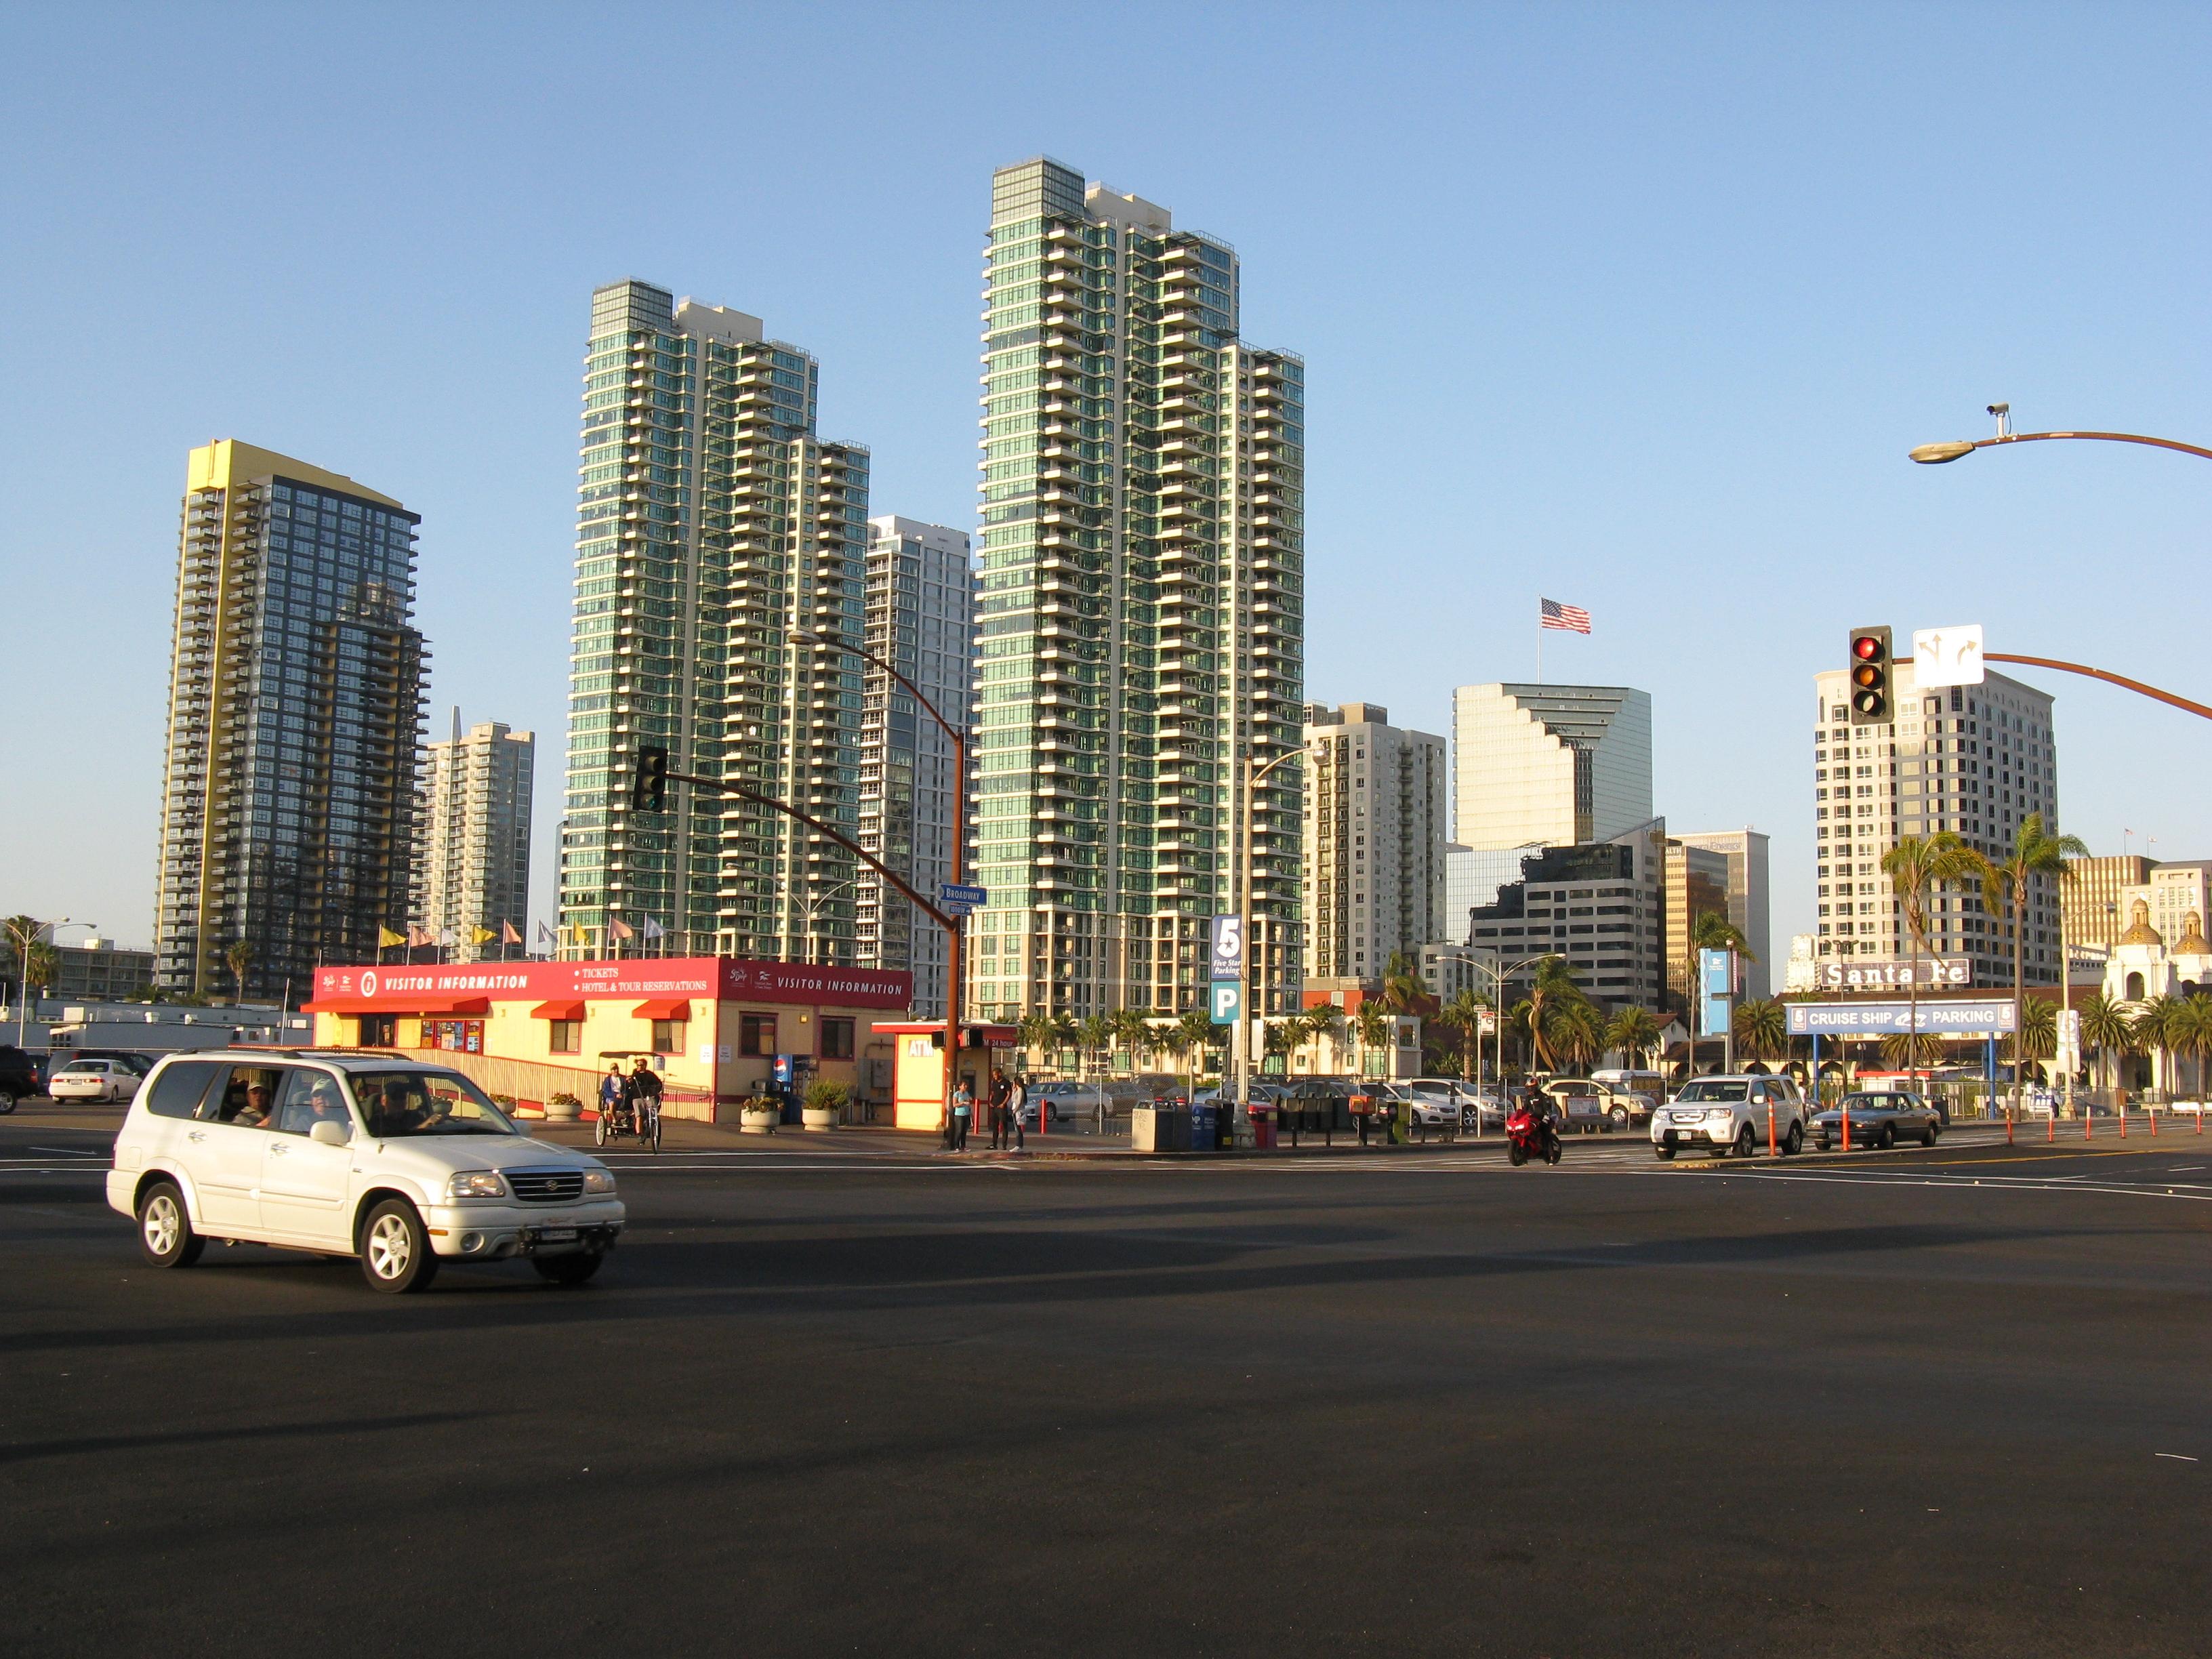 File:Downtown San Diego - panoramio.jpg - Wikimedia Commons